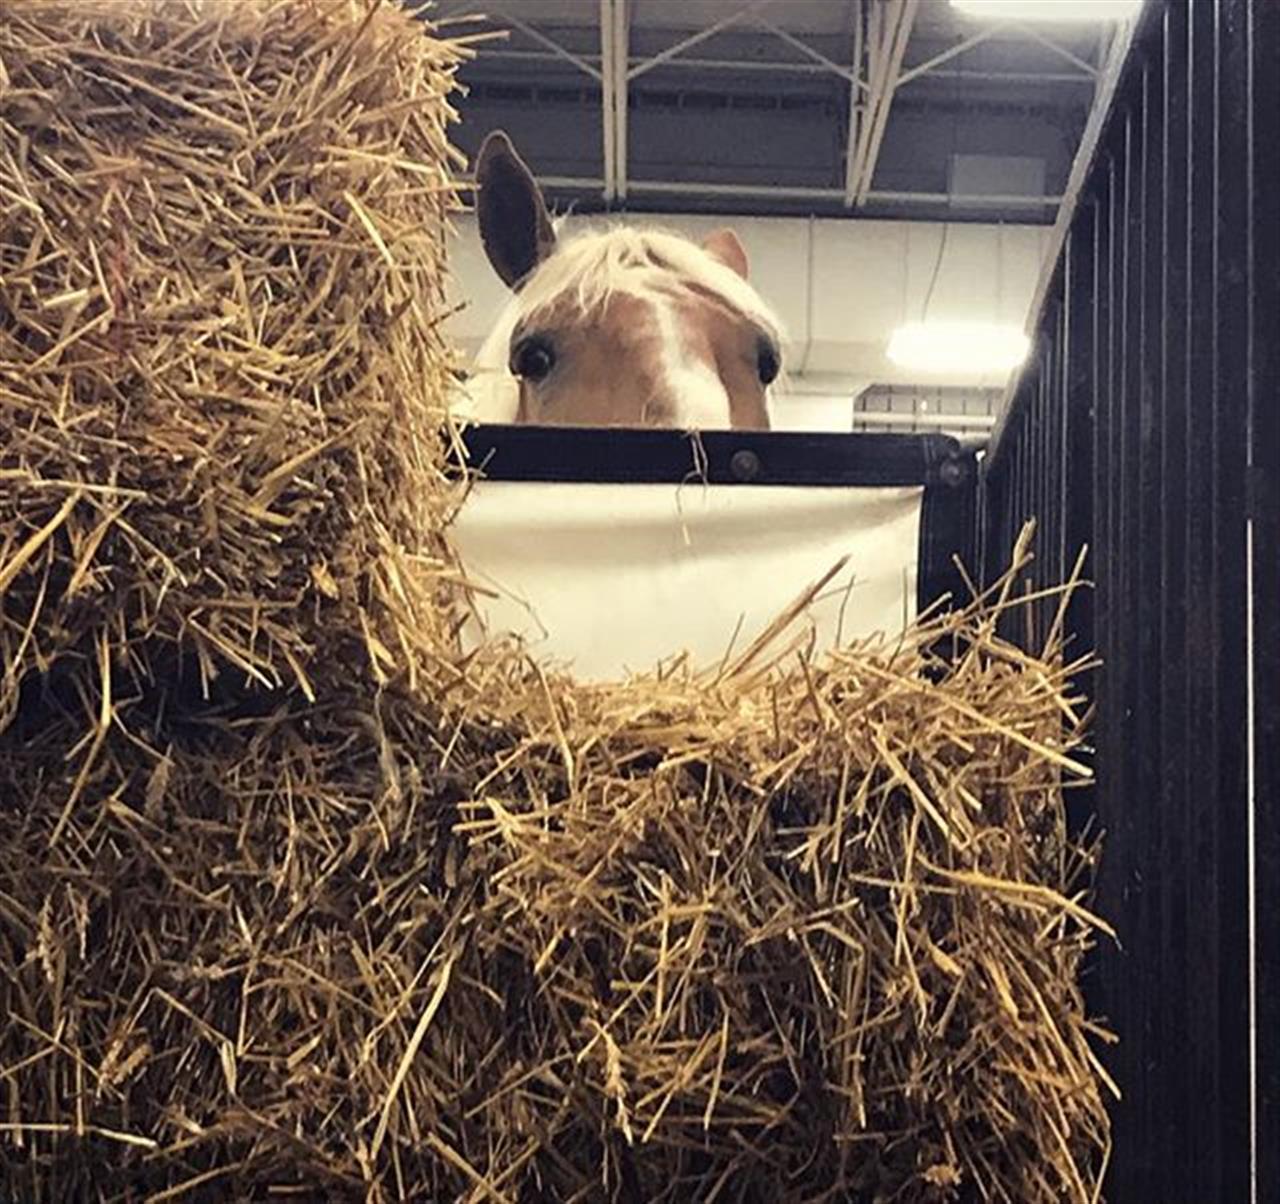 Hay there! ? #indystatefair #indianastatefair #hayisforhorses #carpentercares #LeadingRELocal